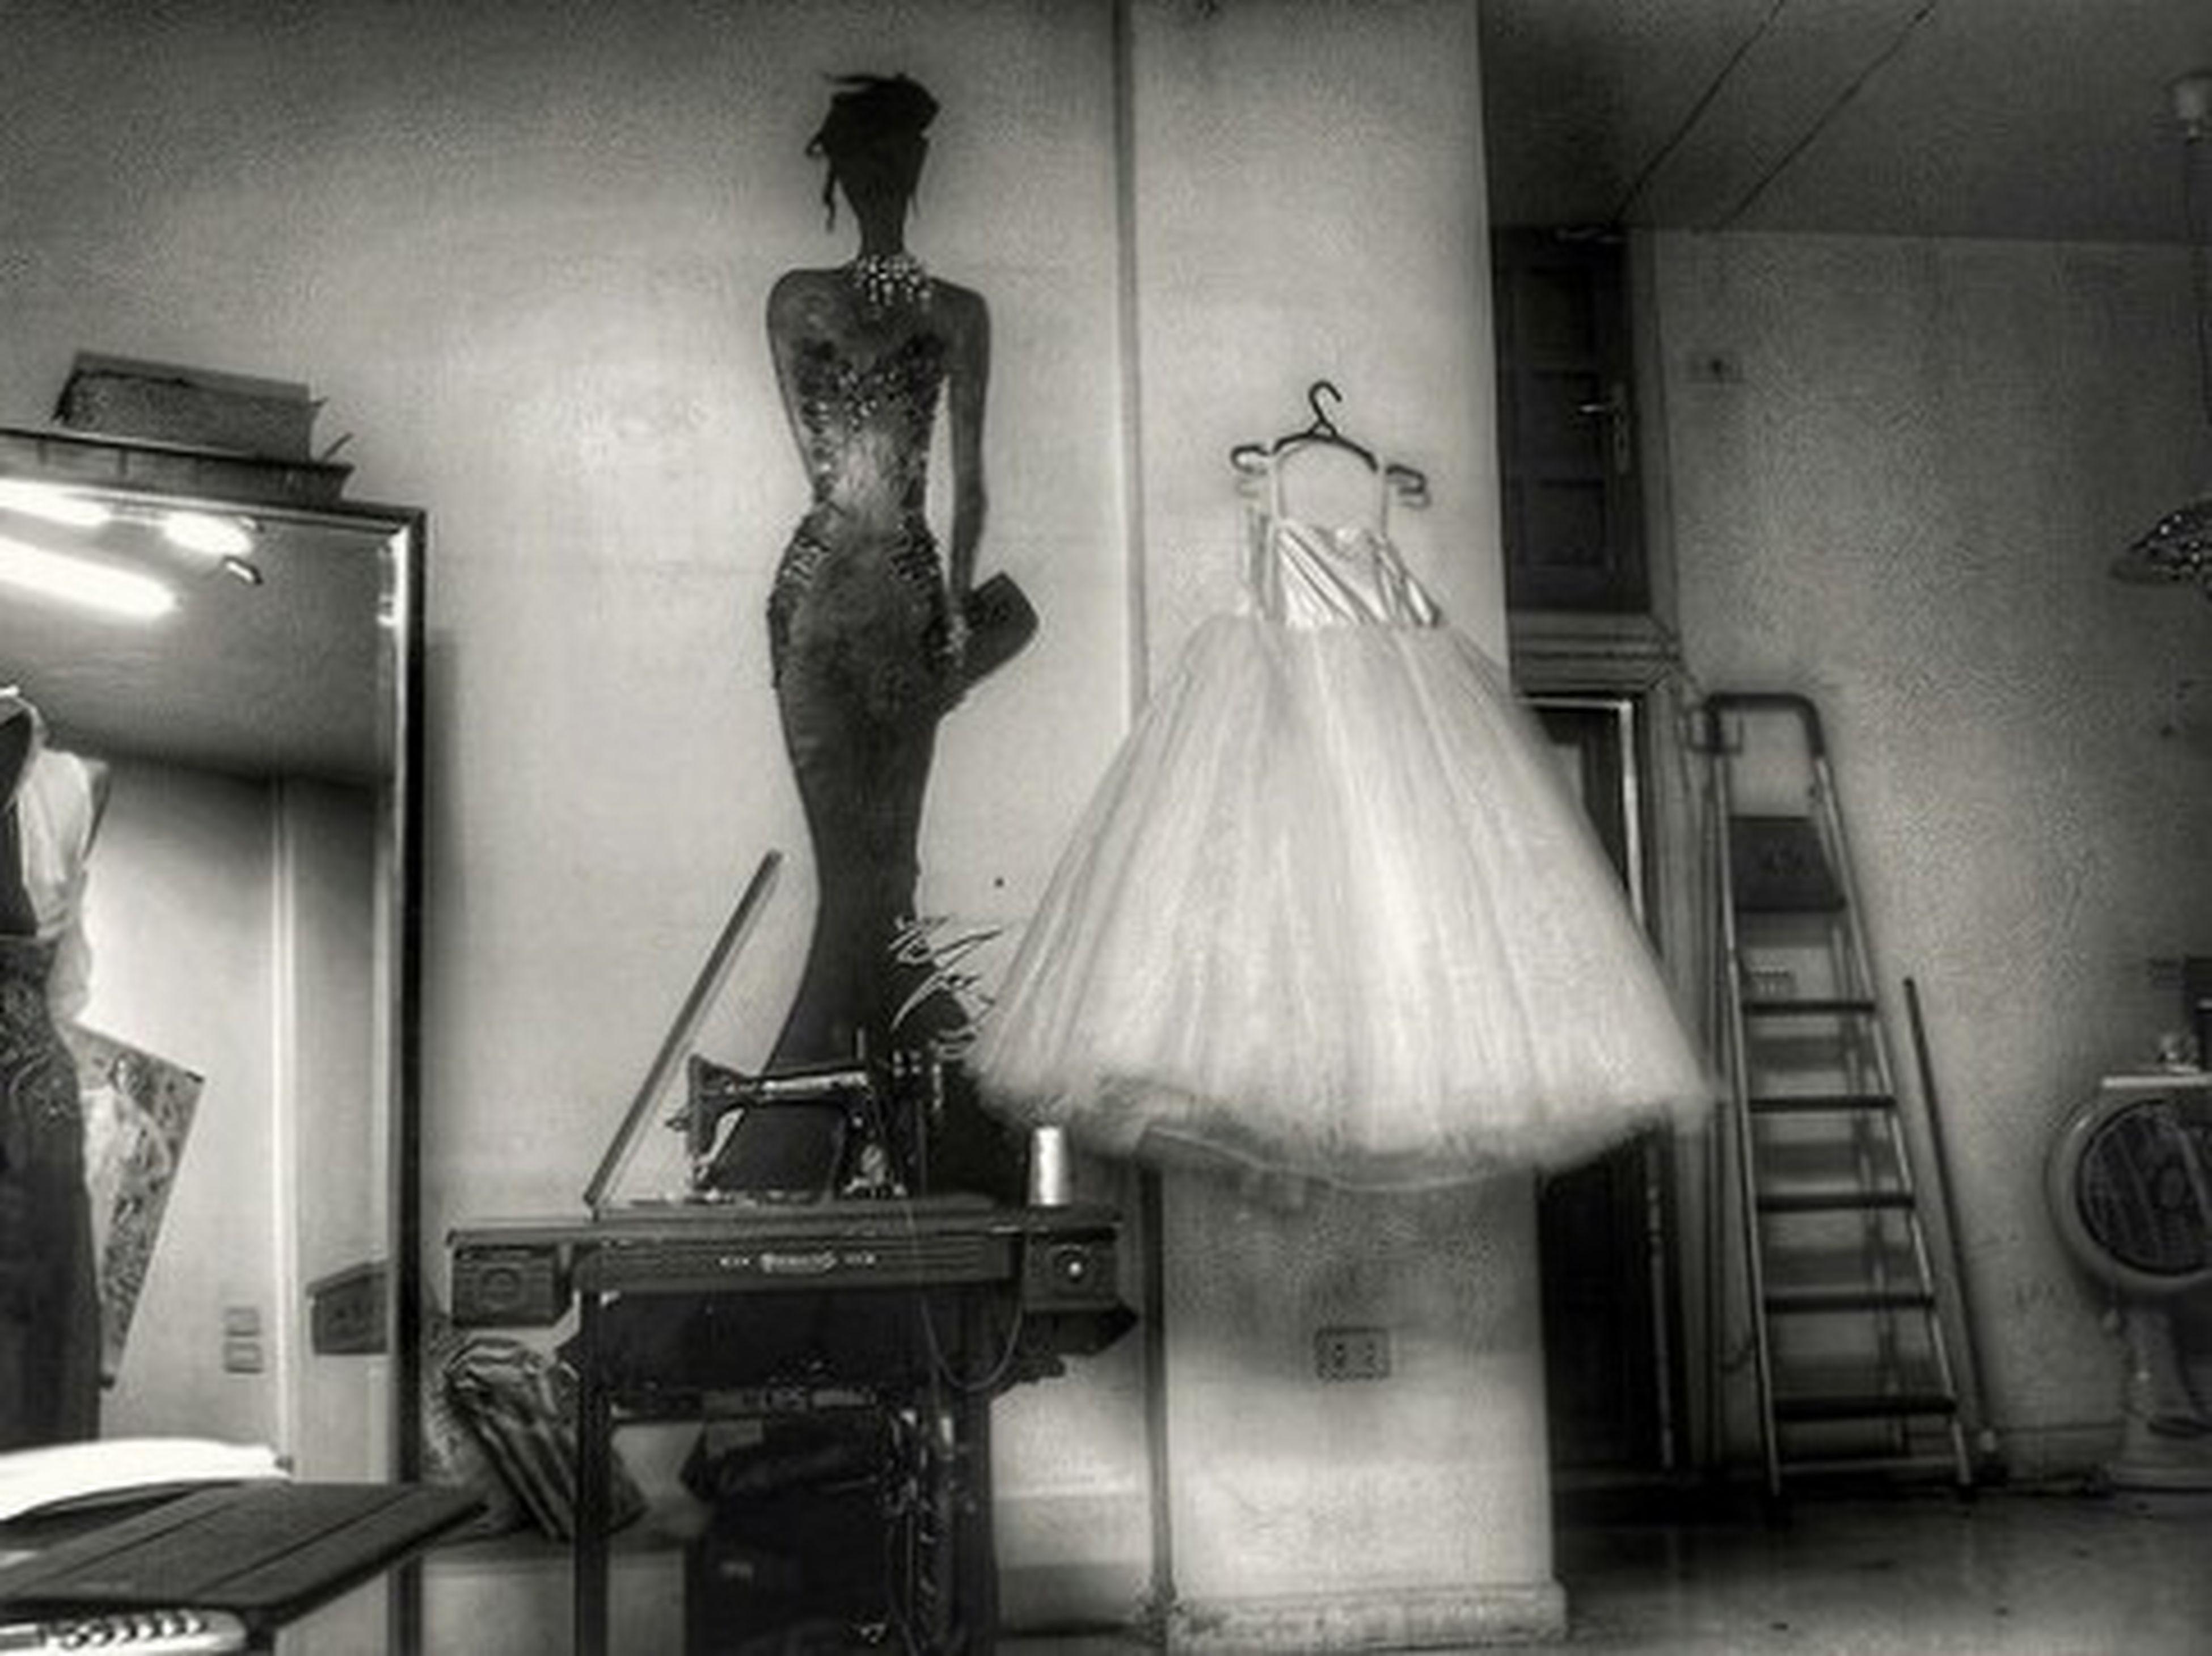 NJ Fahion House Fashion Atelier Black And White Photography Black & White Bride Dress Handmade Mirror Fashionhouse Pearls Damascus